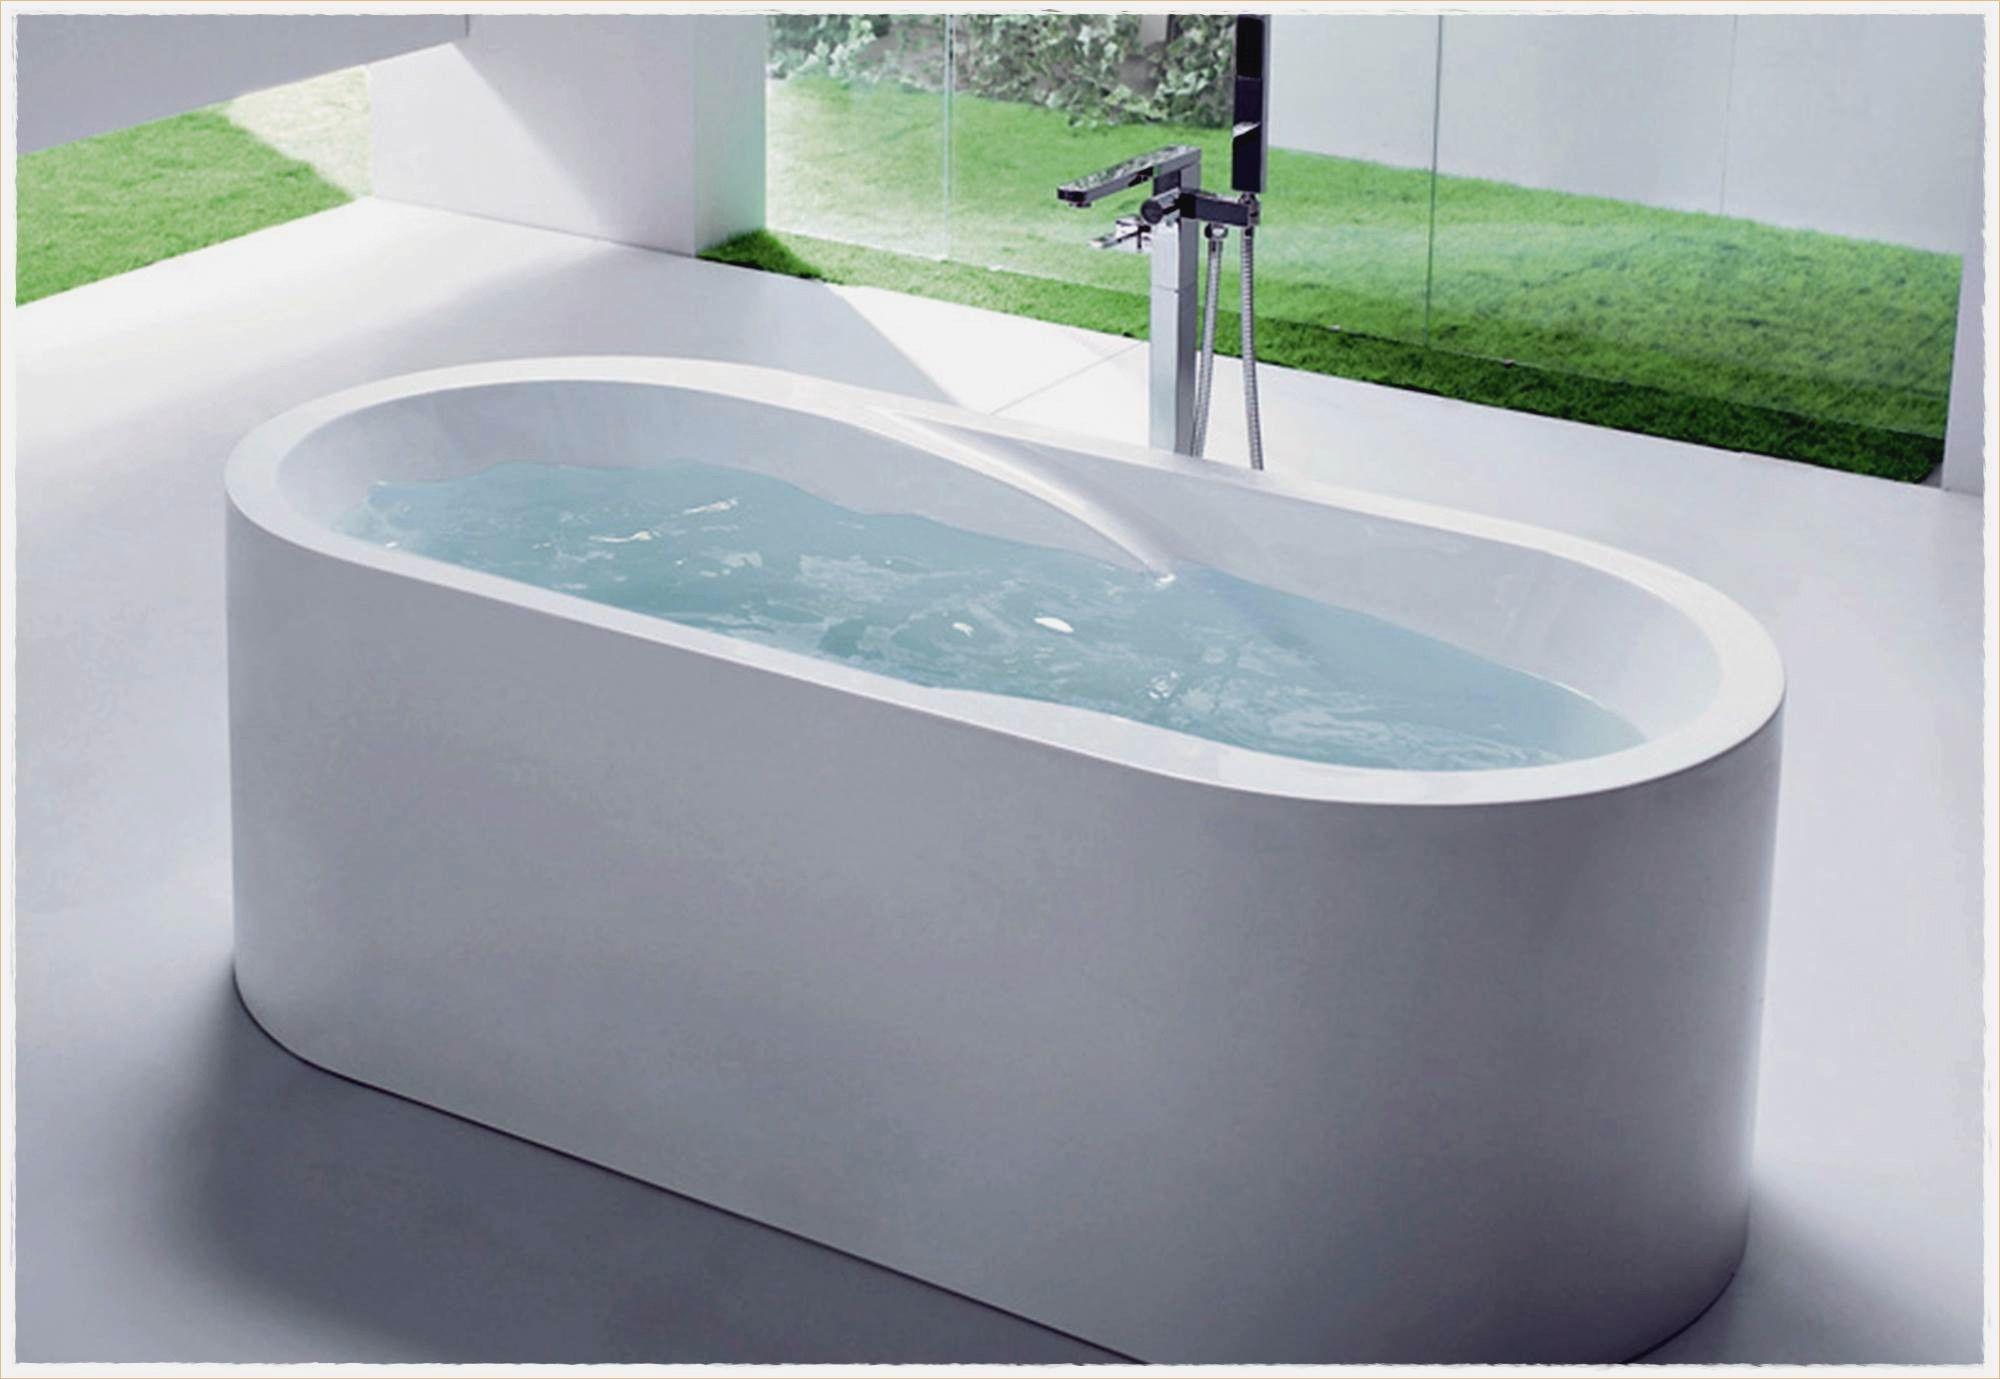 Buse Baignoire Balneo Brico Depot Dans Plusieurs Styles De Decoration Corner Bathtub Bathtub Bathroom